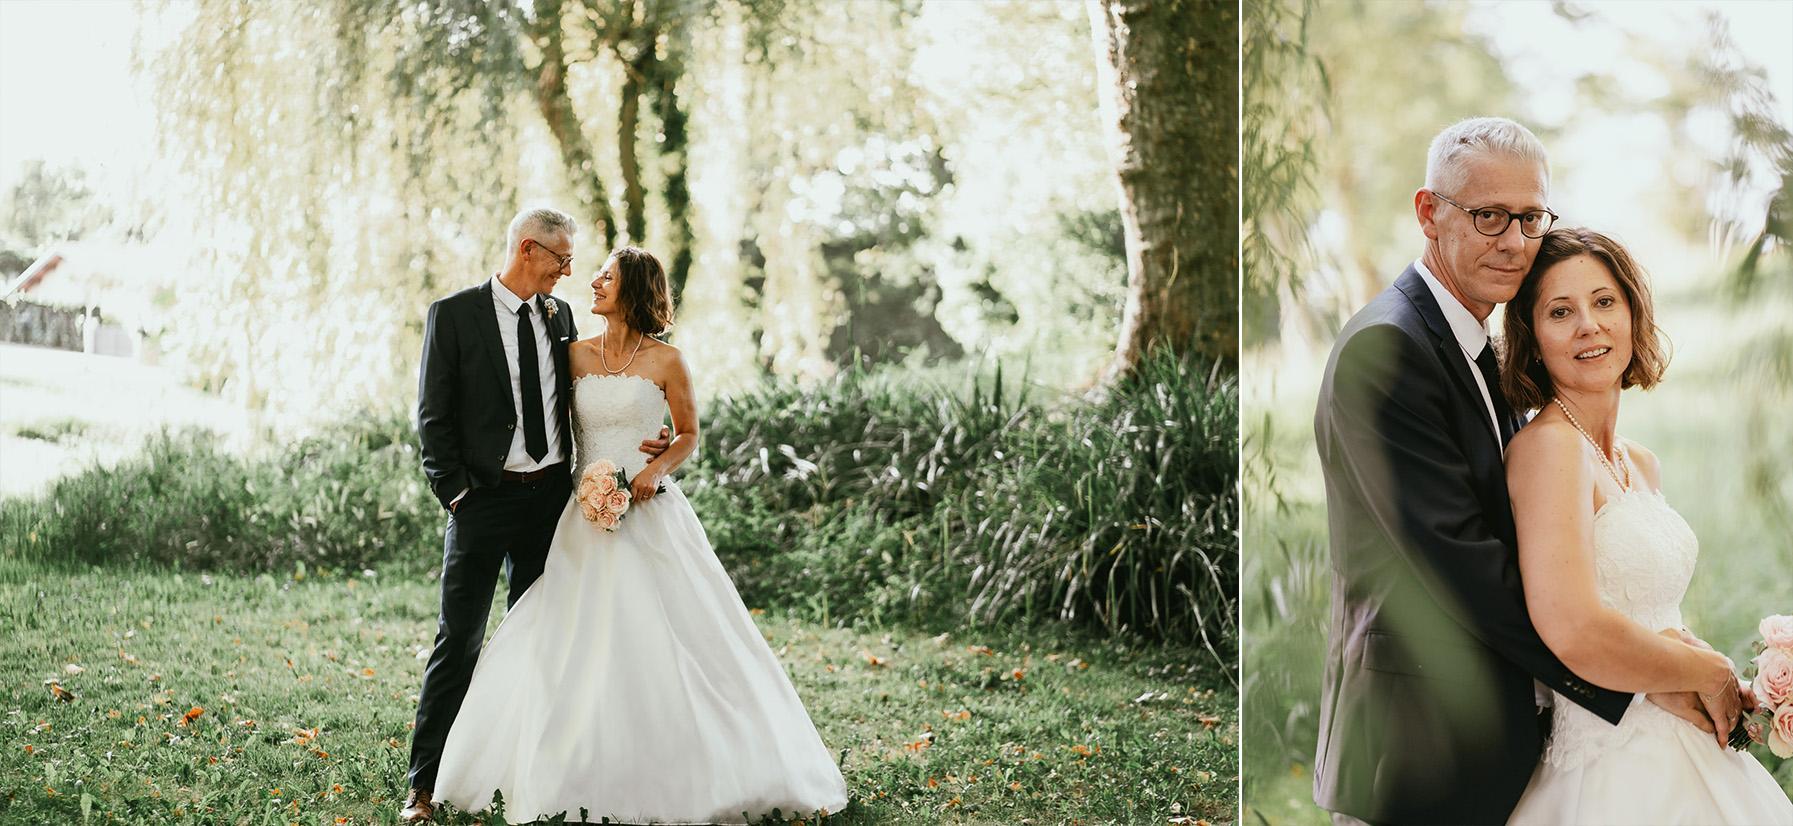 Photographe mariage landes dax aquitaine 5